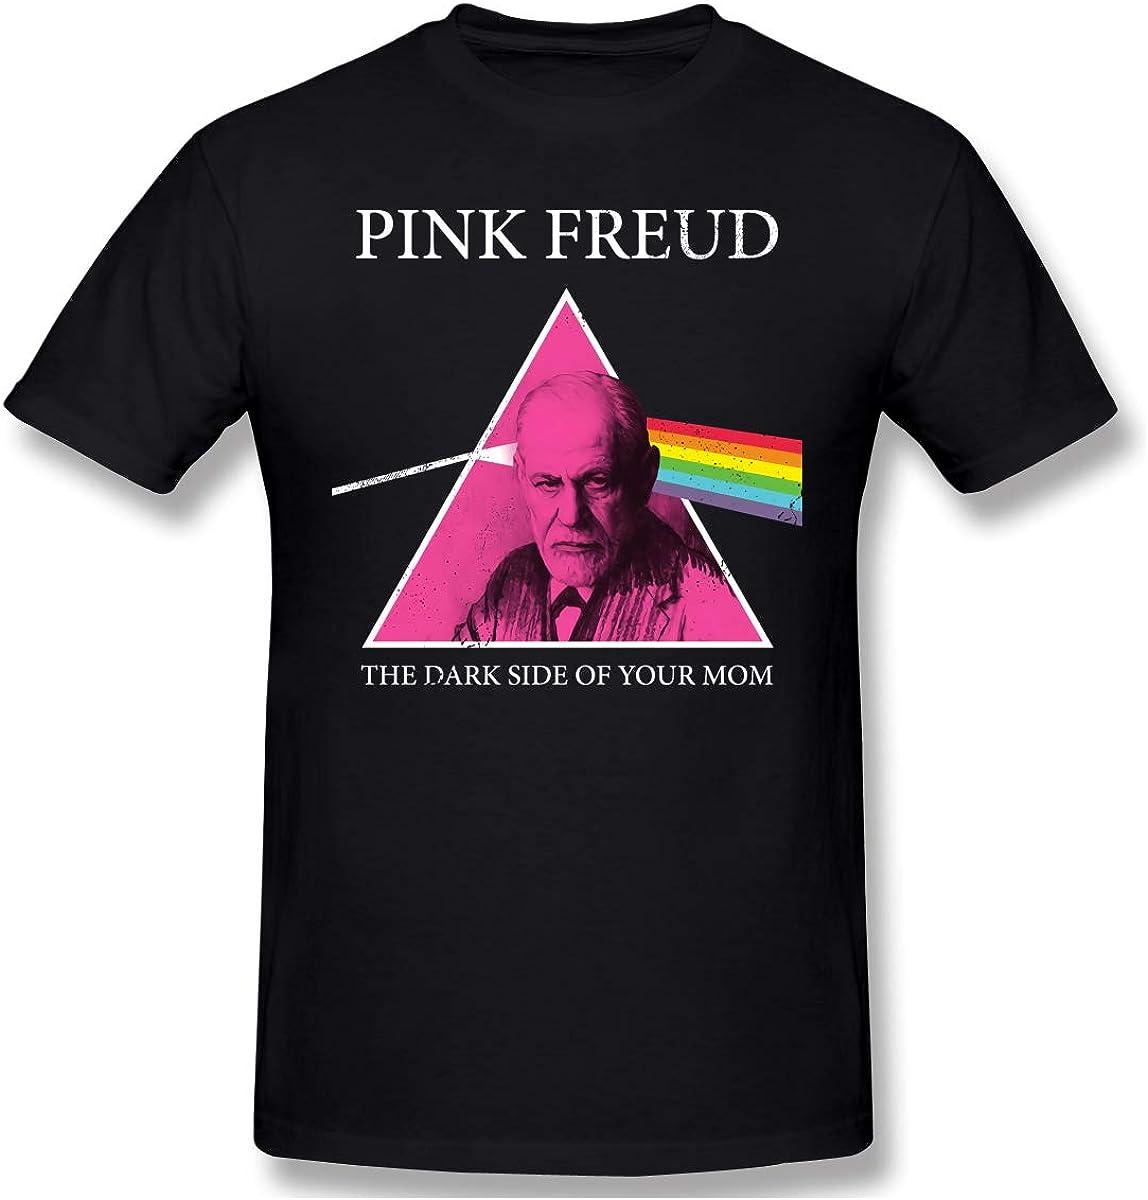 Freud Dark Side Of Your Mom Music Rock Band Parody Psycho Funny Black T-shirt